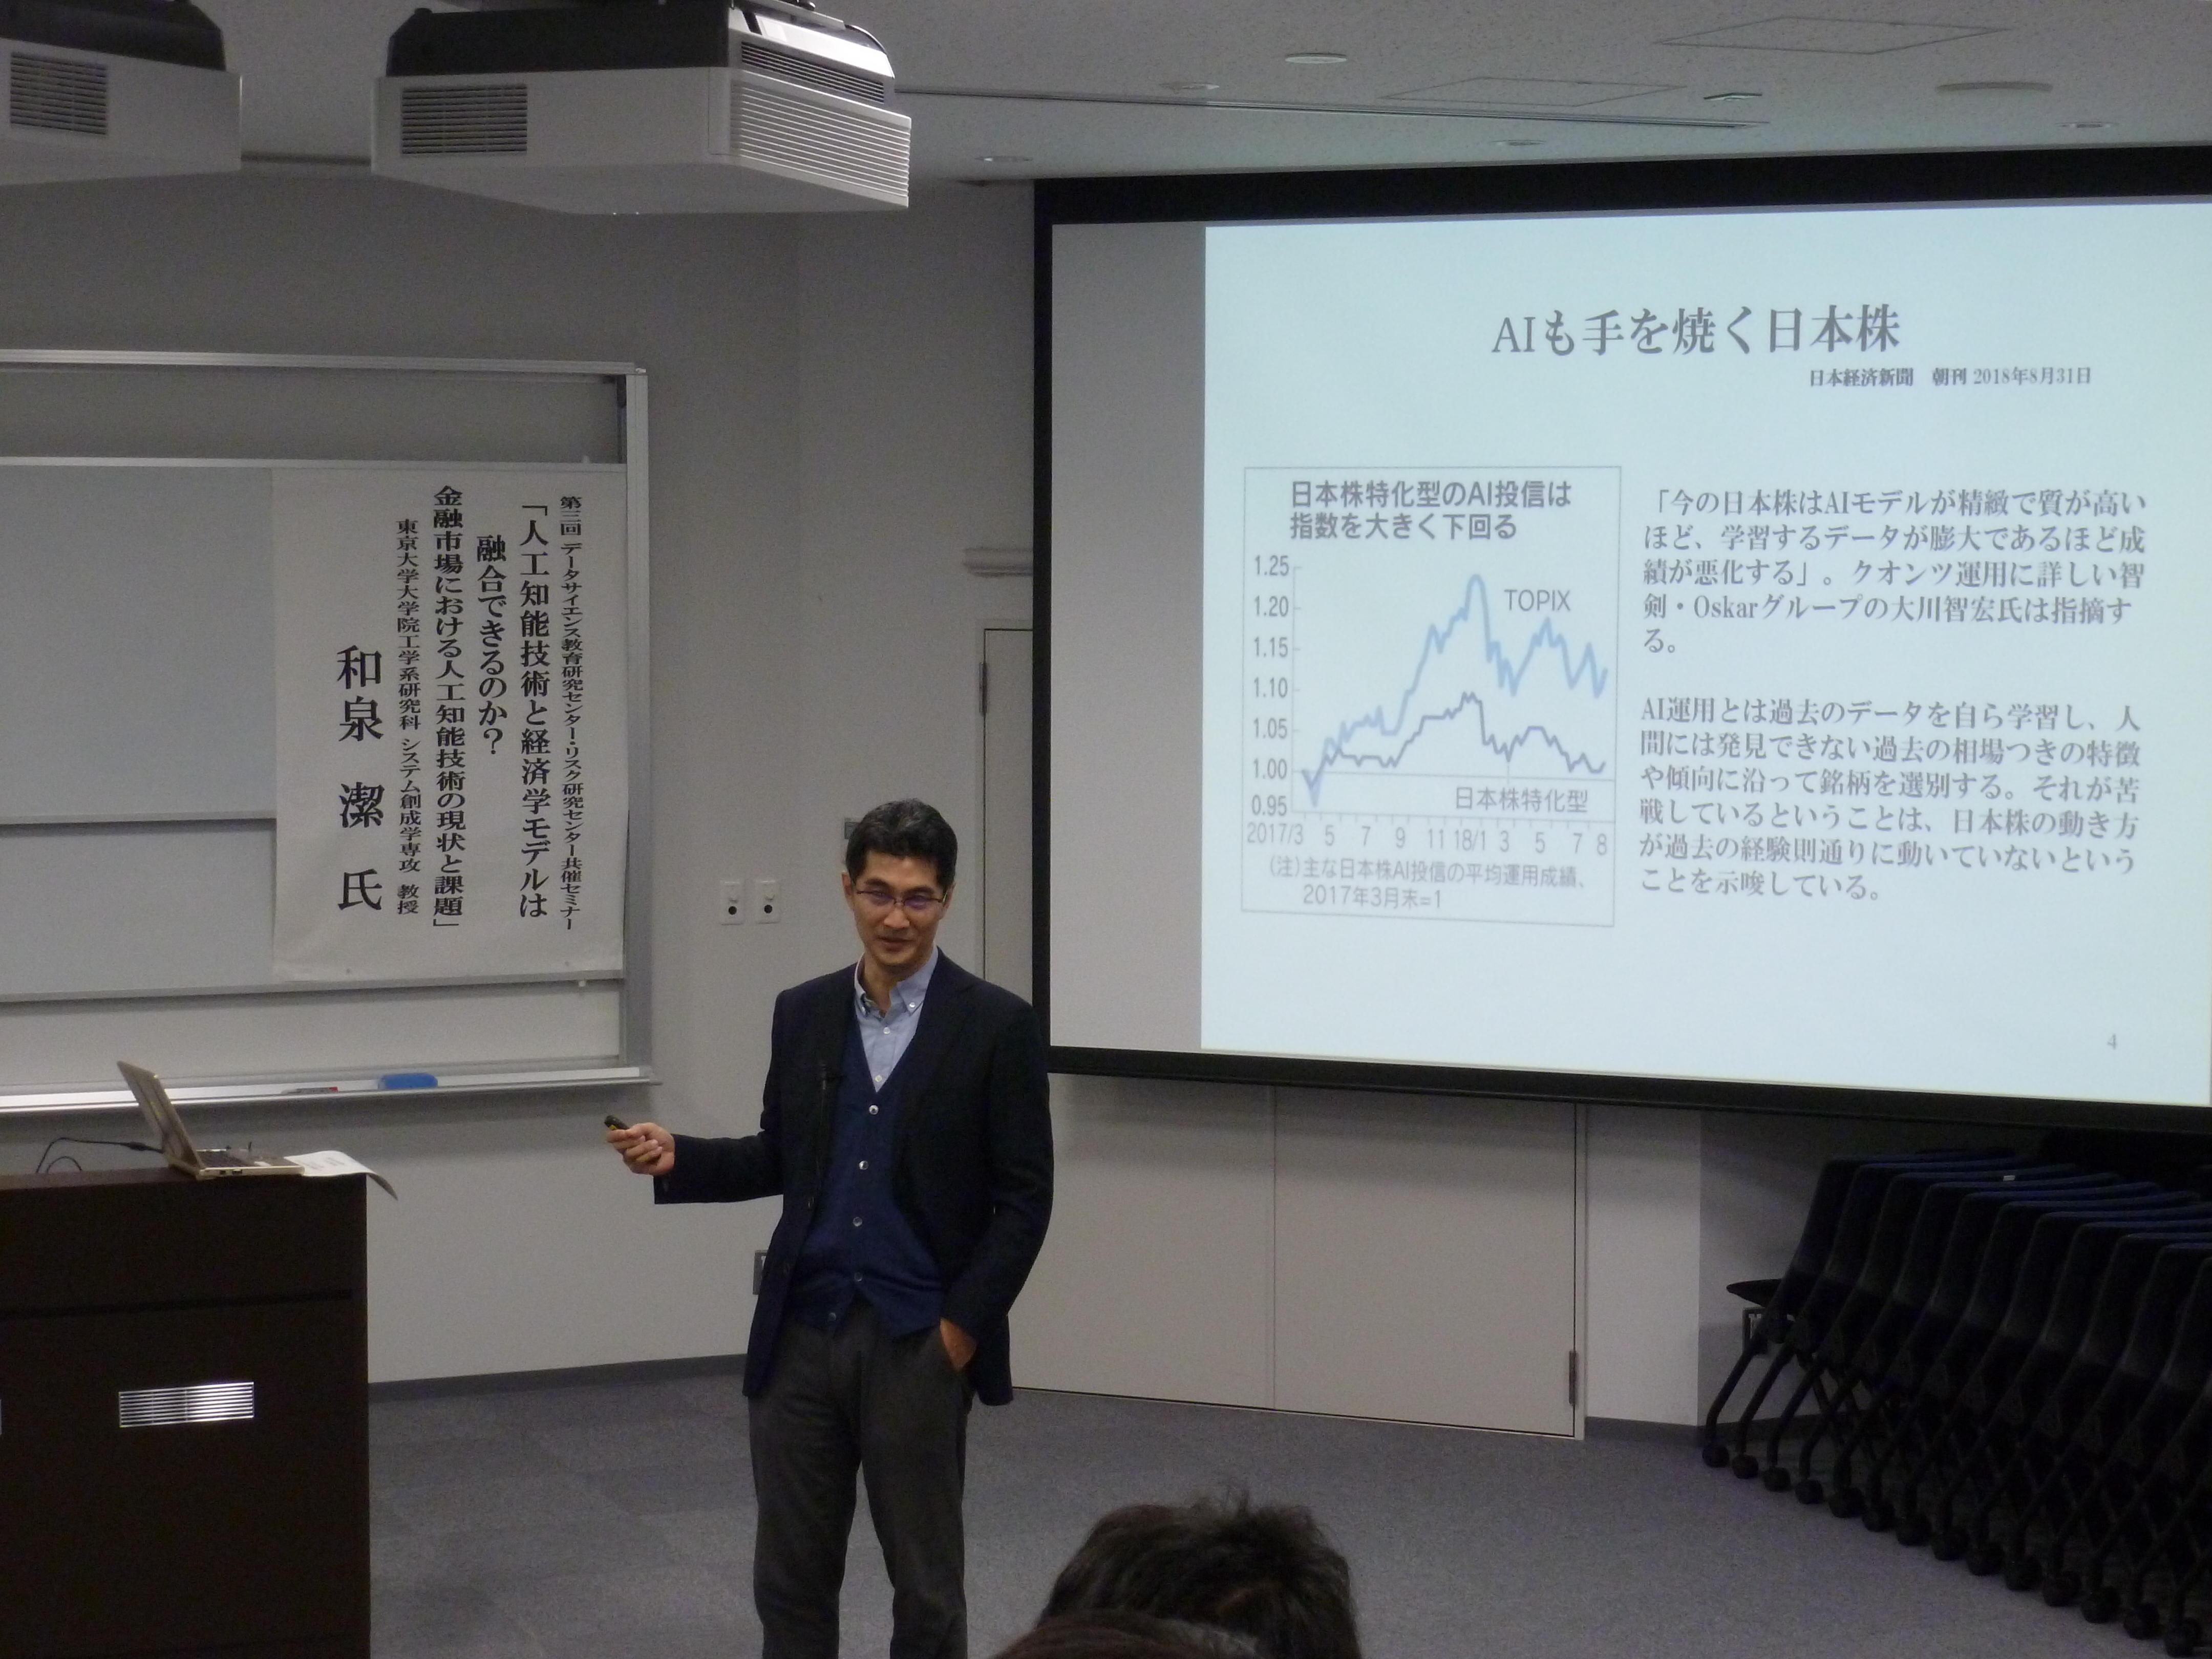 https://www.econ.shiga-u.ac.jp/risk/P1040610.JPG